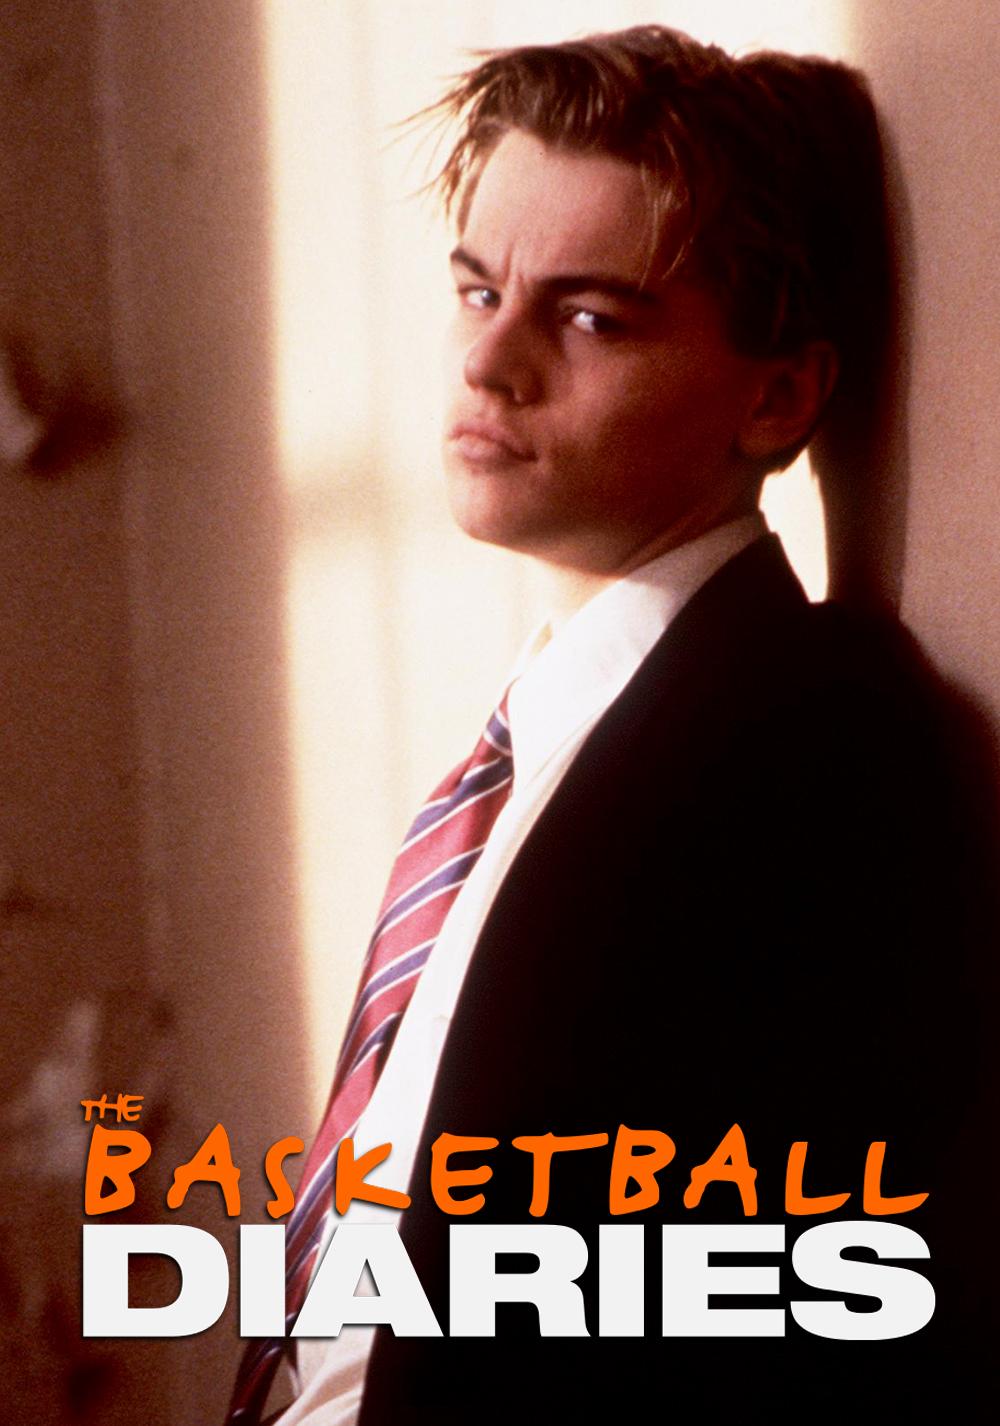 The Basketball Diaries | Movie fanart | fanart.tv